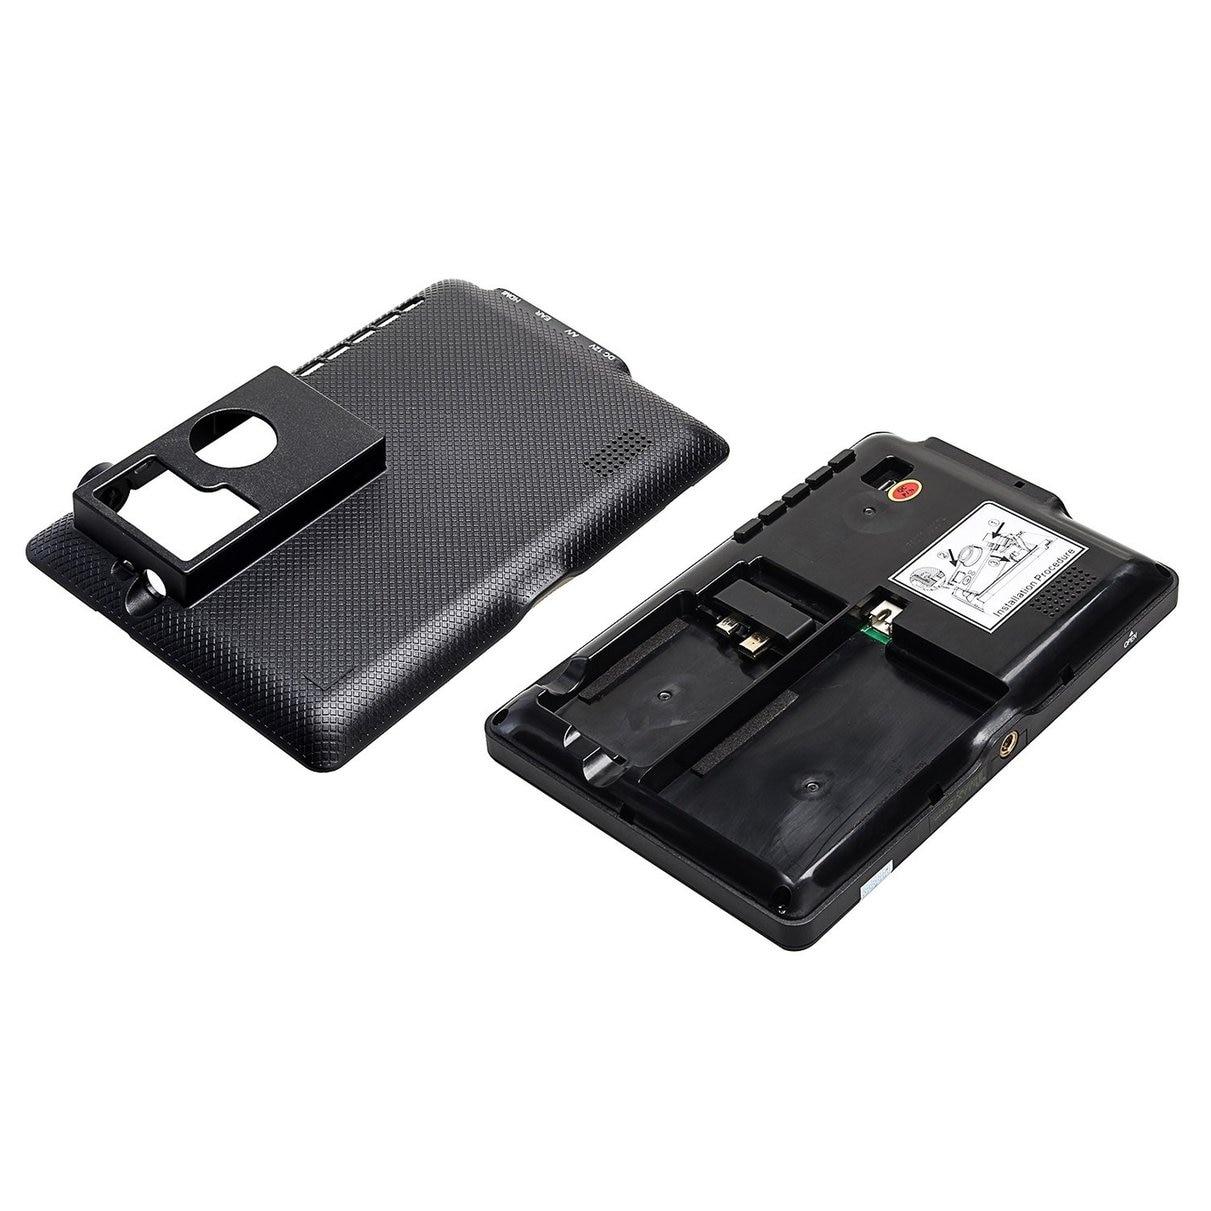 Lilliput MoPro7 DSLR камера с 2600 мАч встроенной батареей HDMI и AV вход специфический монитор для GoPro Hero 3 + 4 sony Canon Nikon - 4